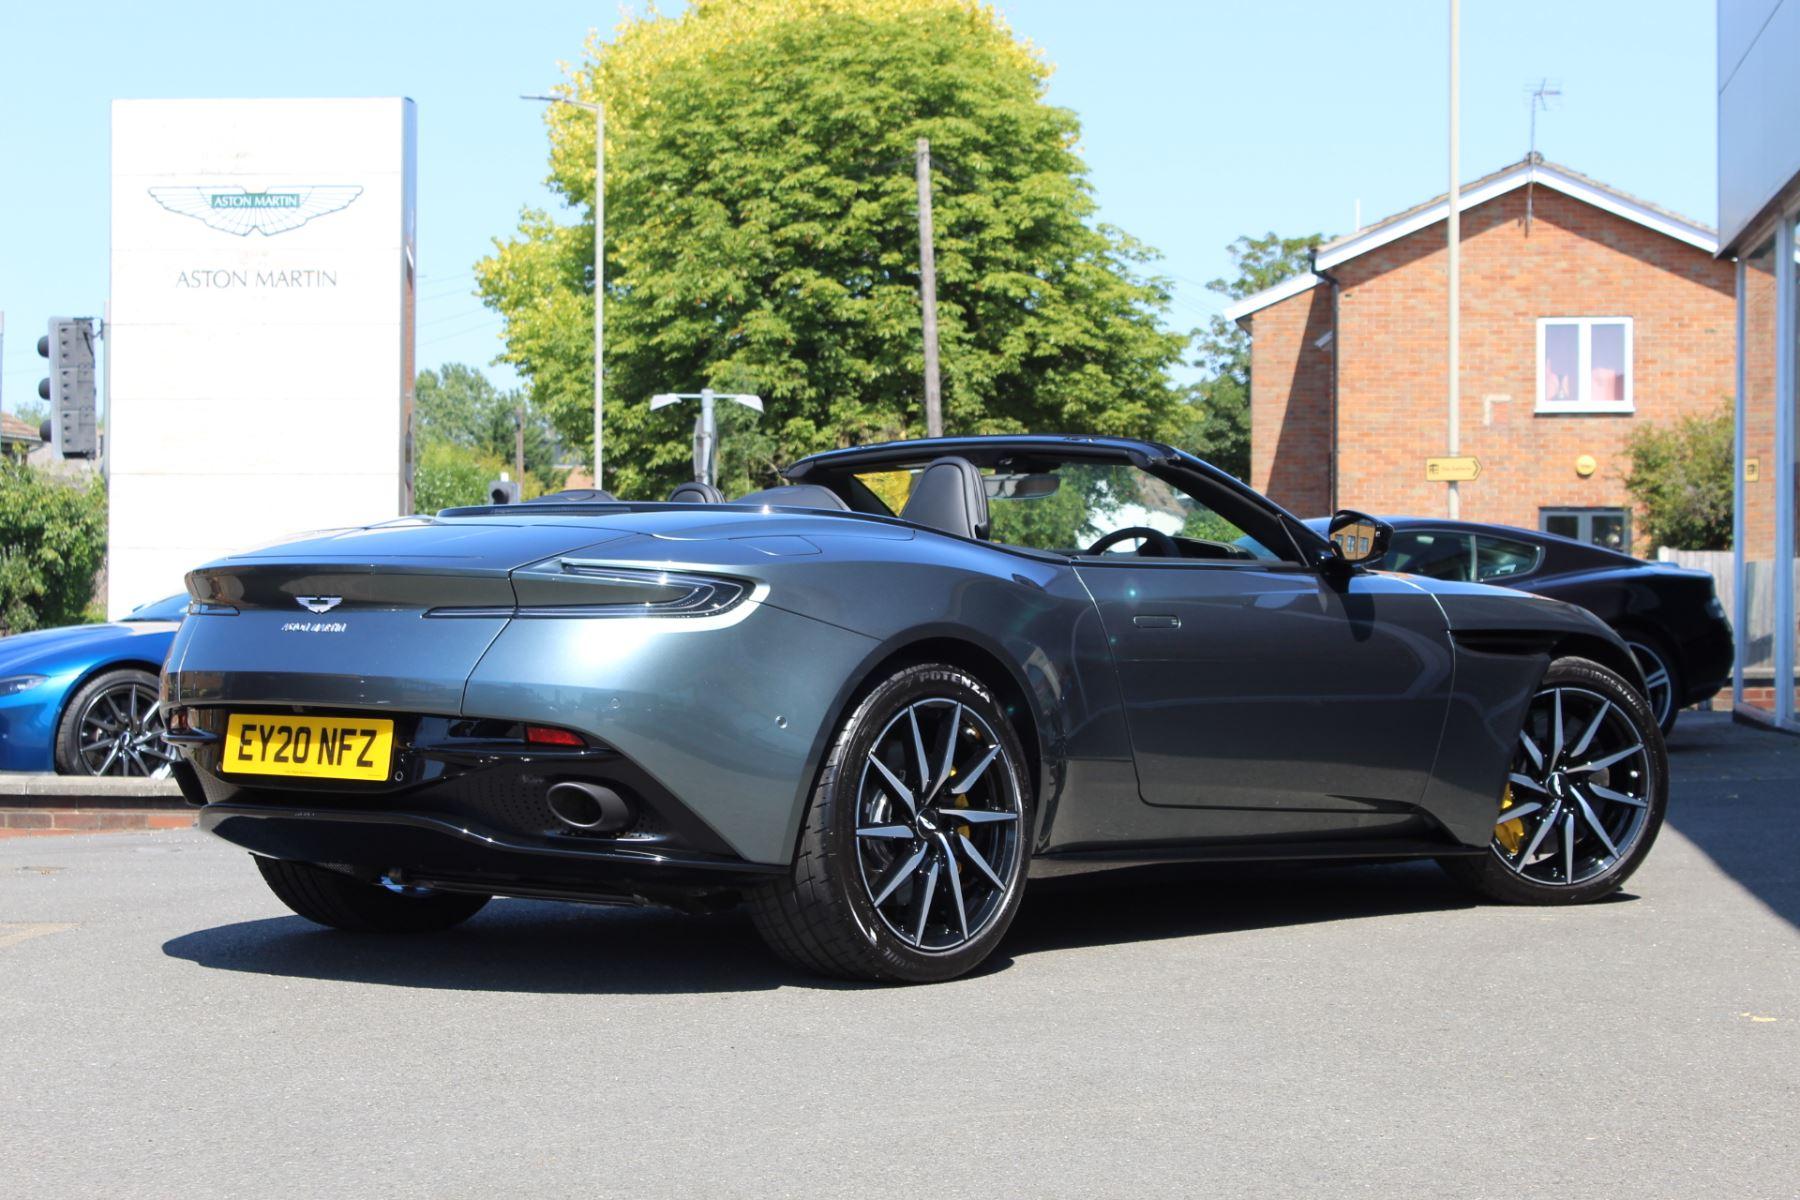 Aston Martin DB11 V8 Volante 2dr Touchtronic image 17